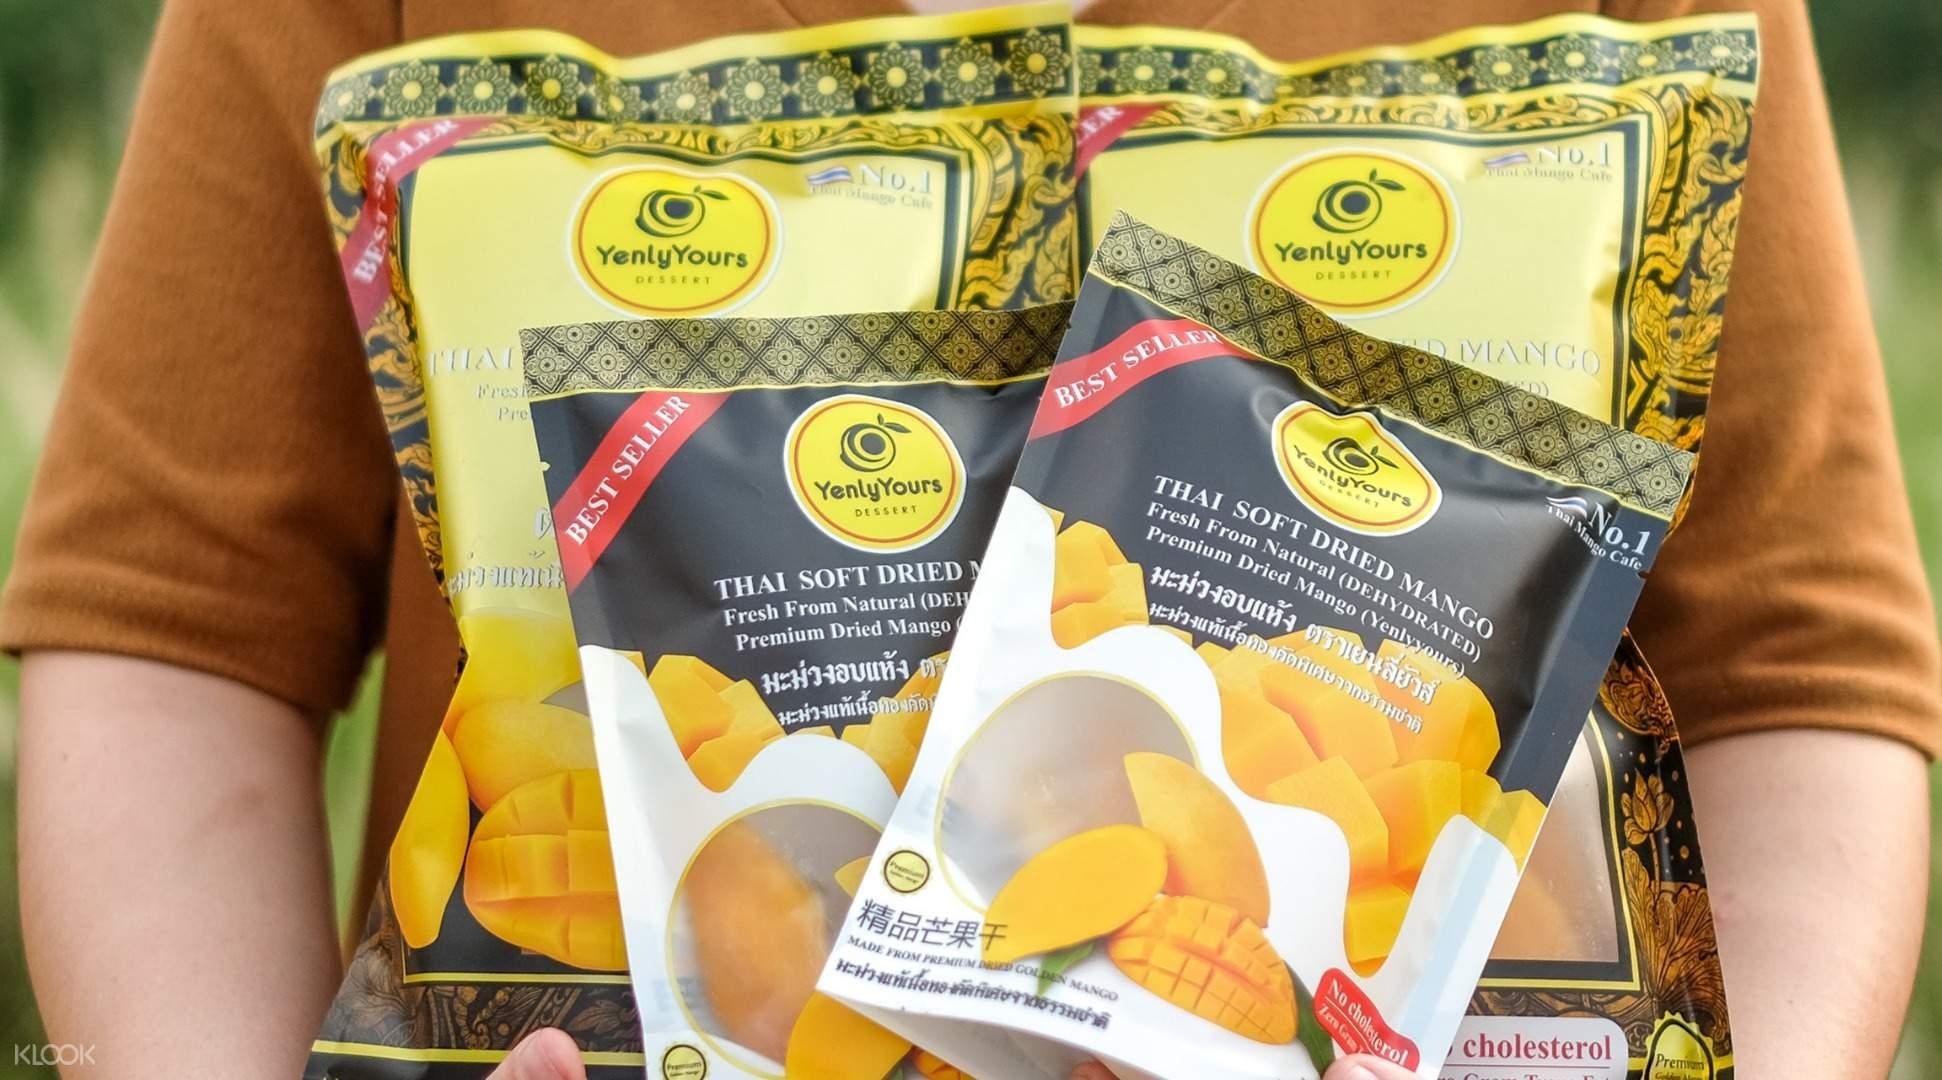 Yenly Yours Dessert Soft Dried Mango In Bangkok